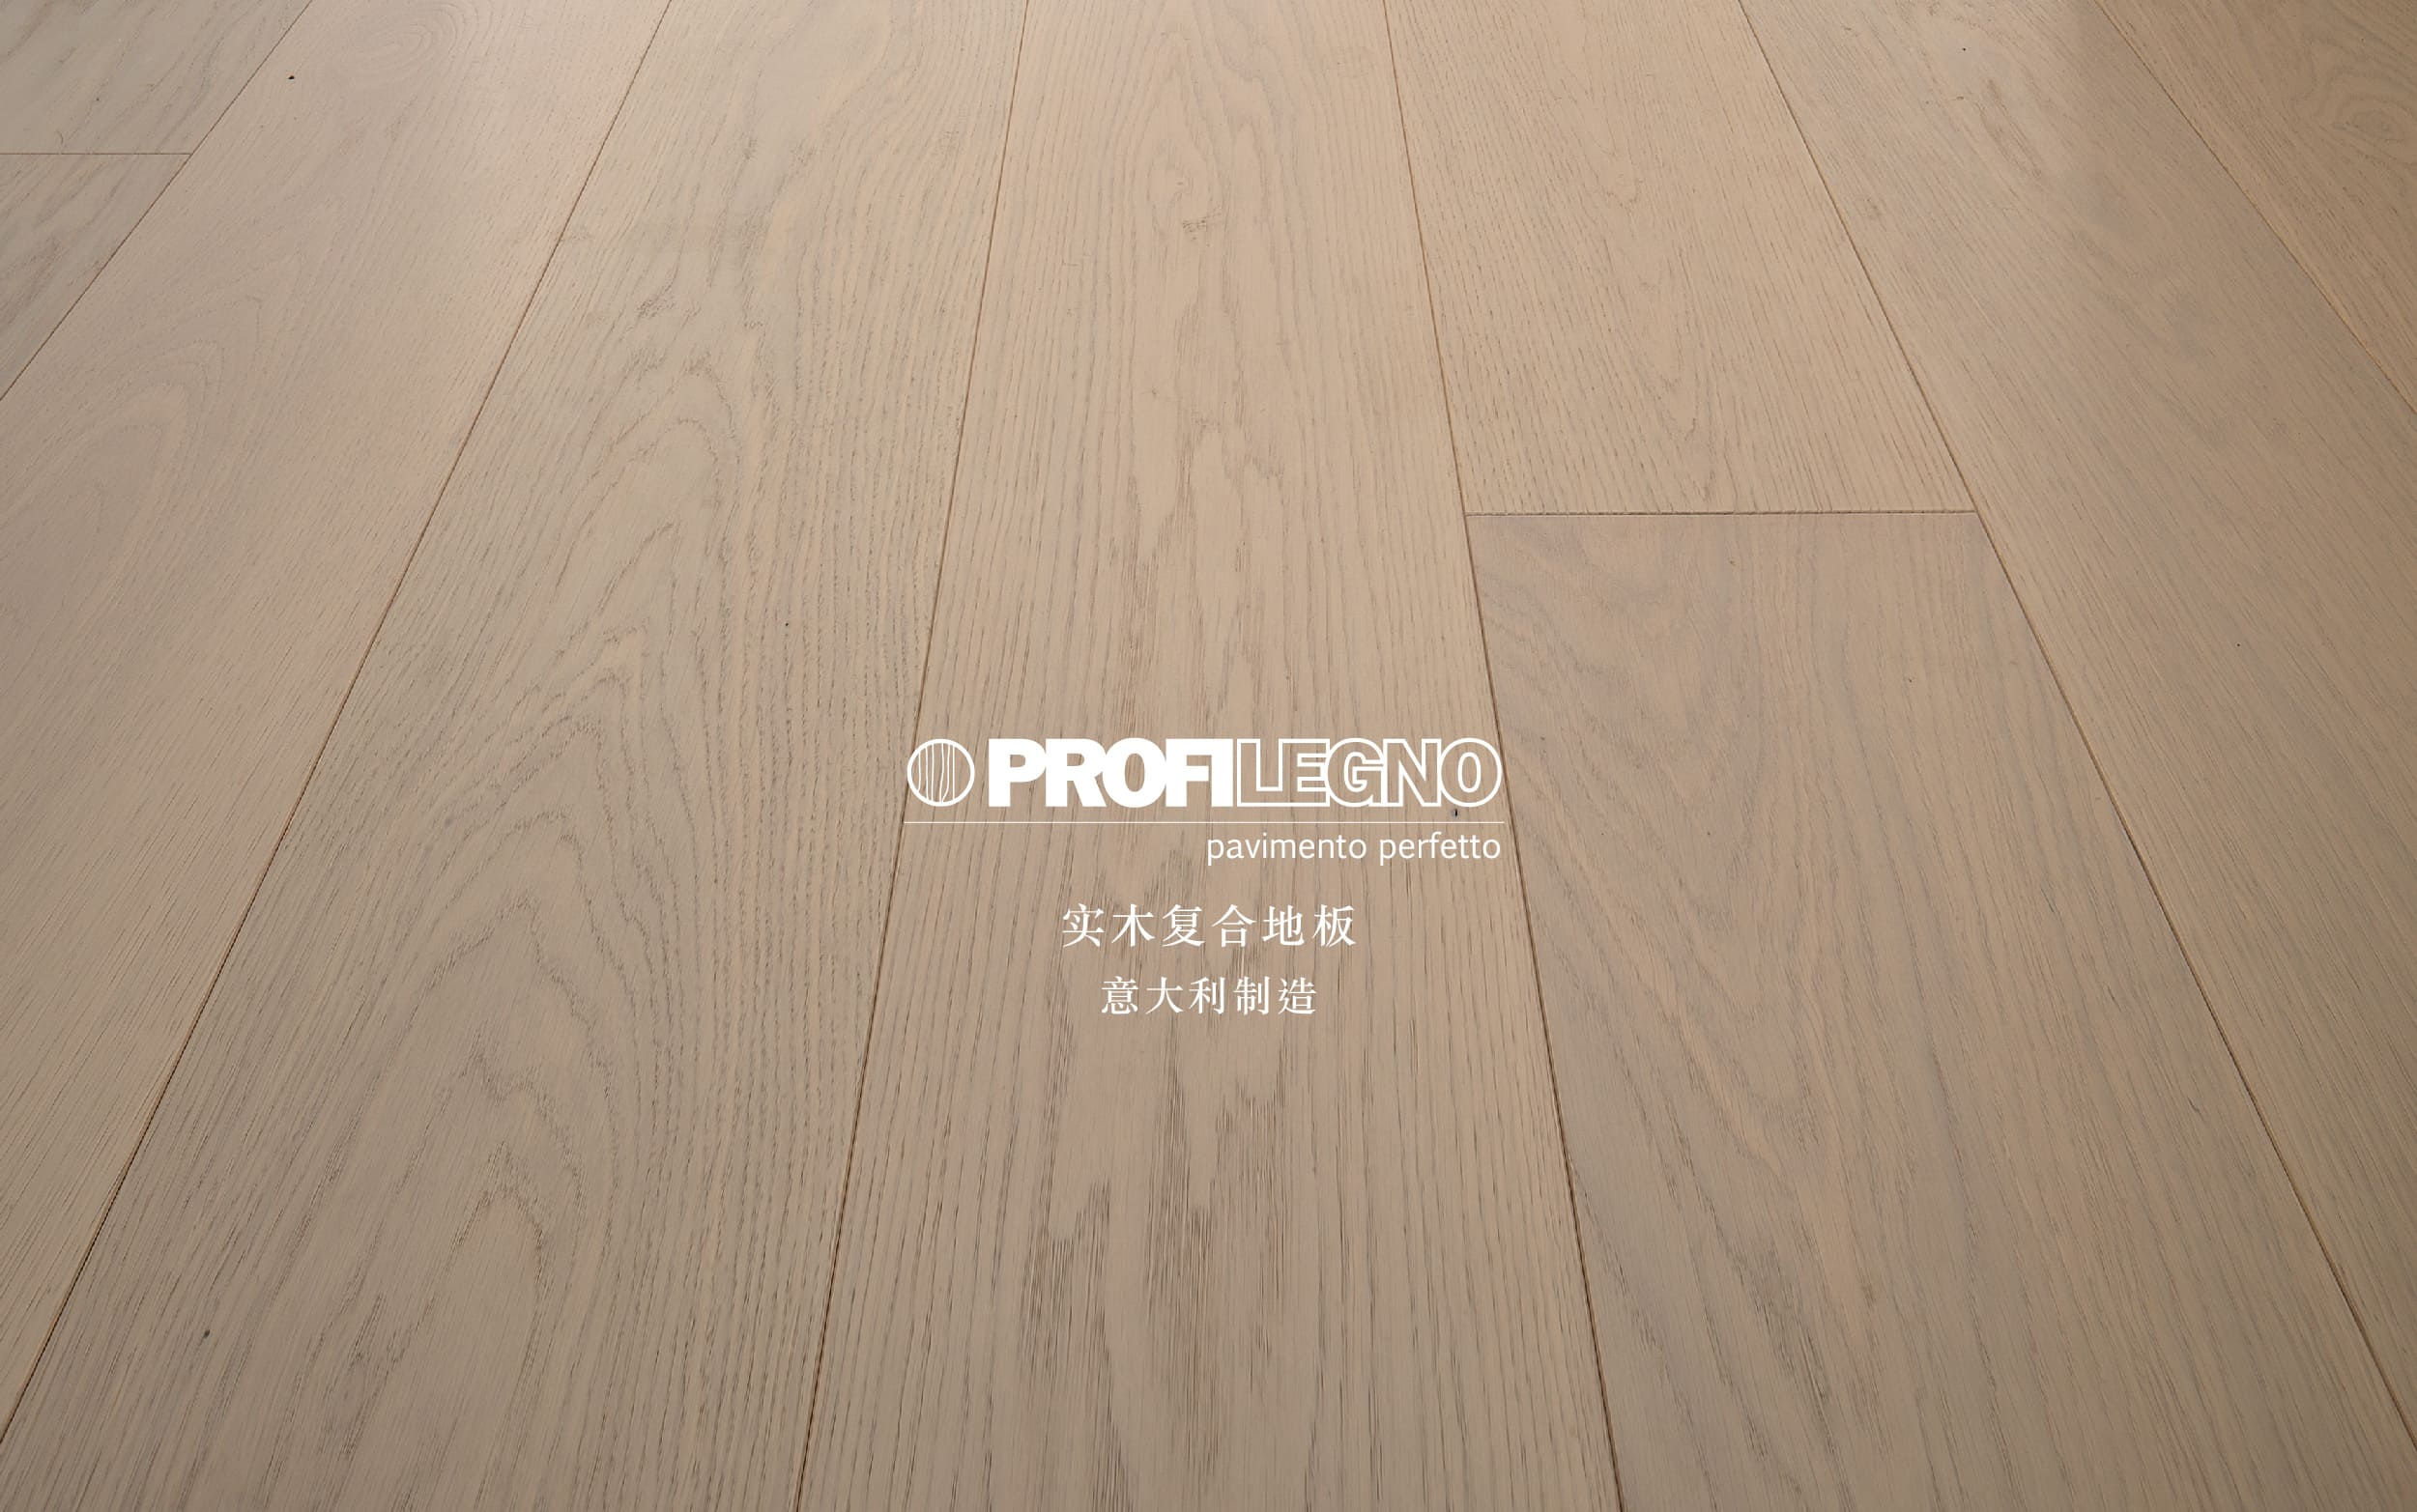 Tat Ming Flooring Profilegno